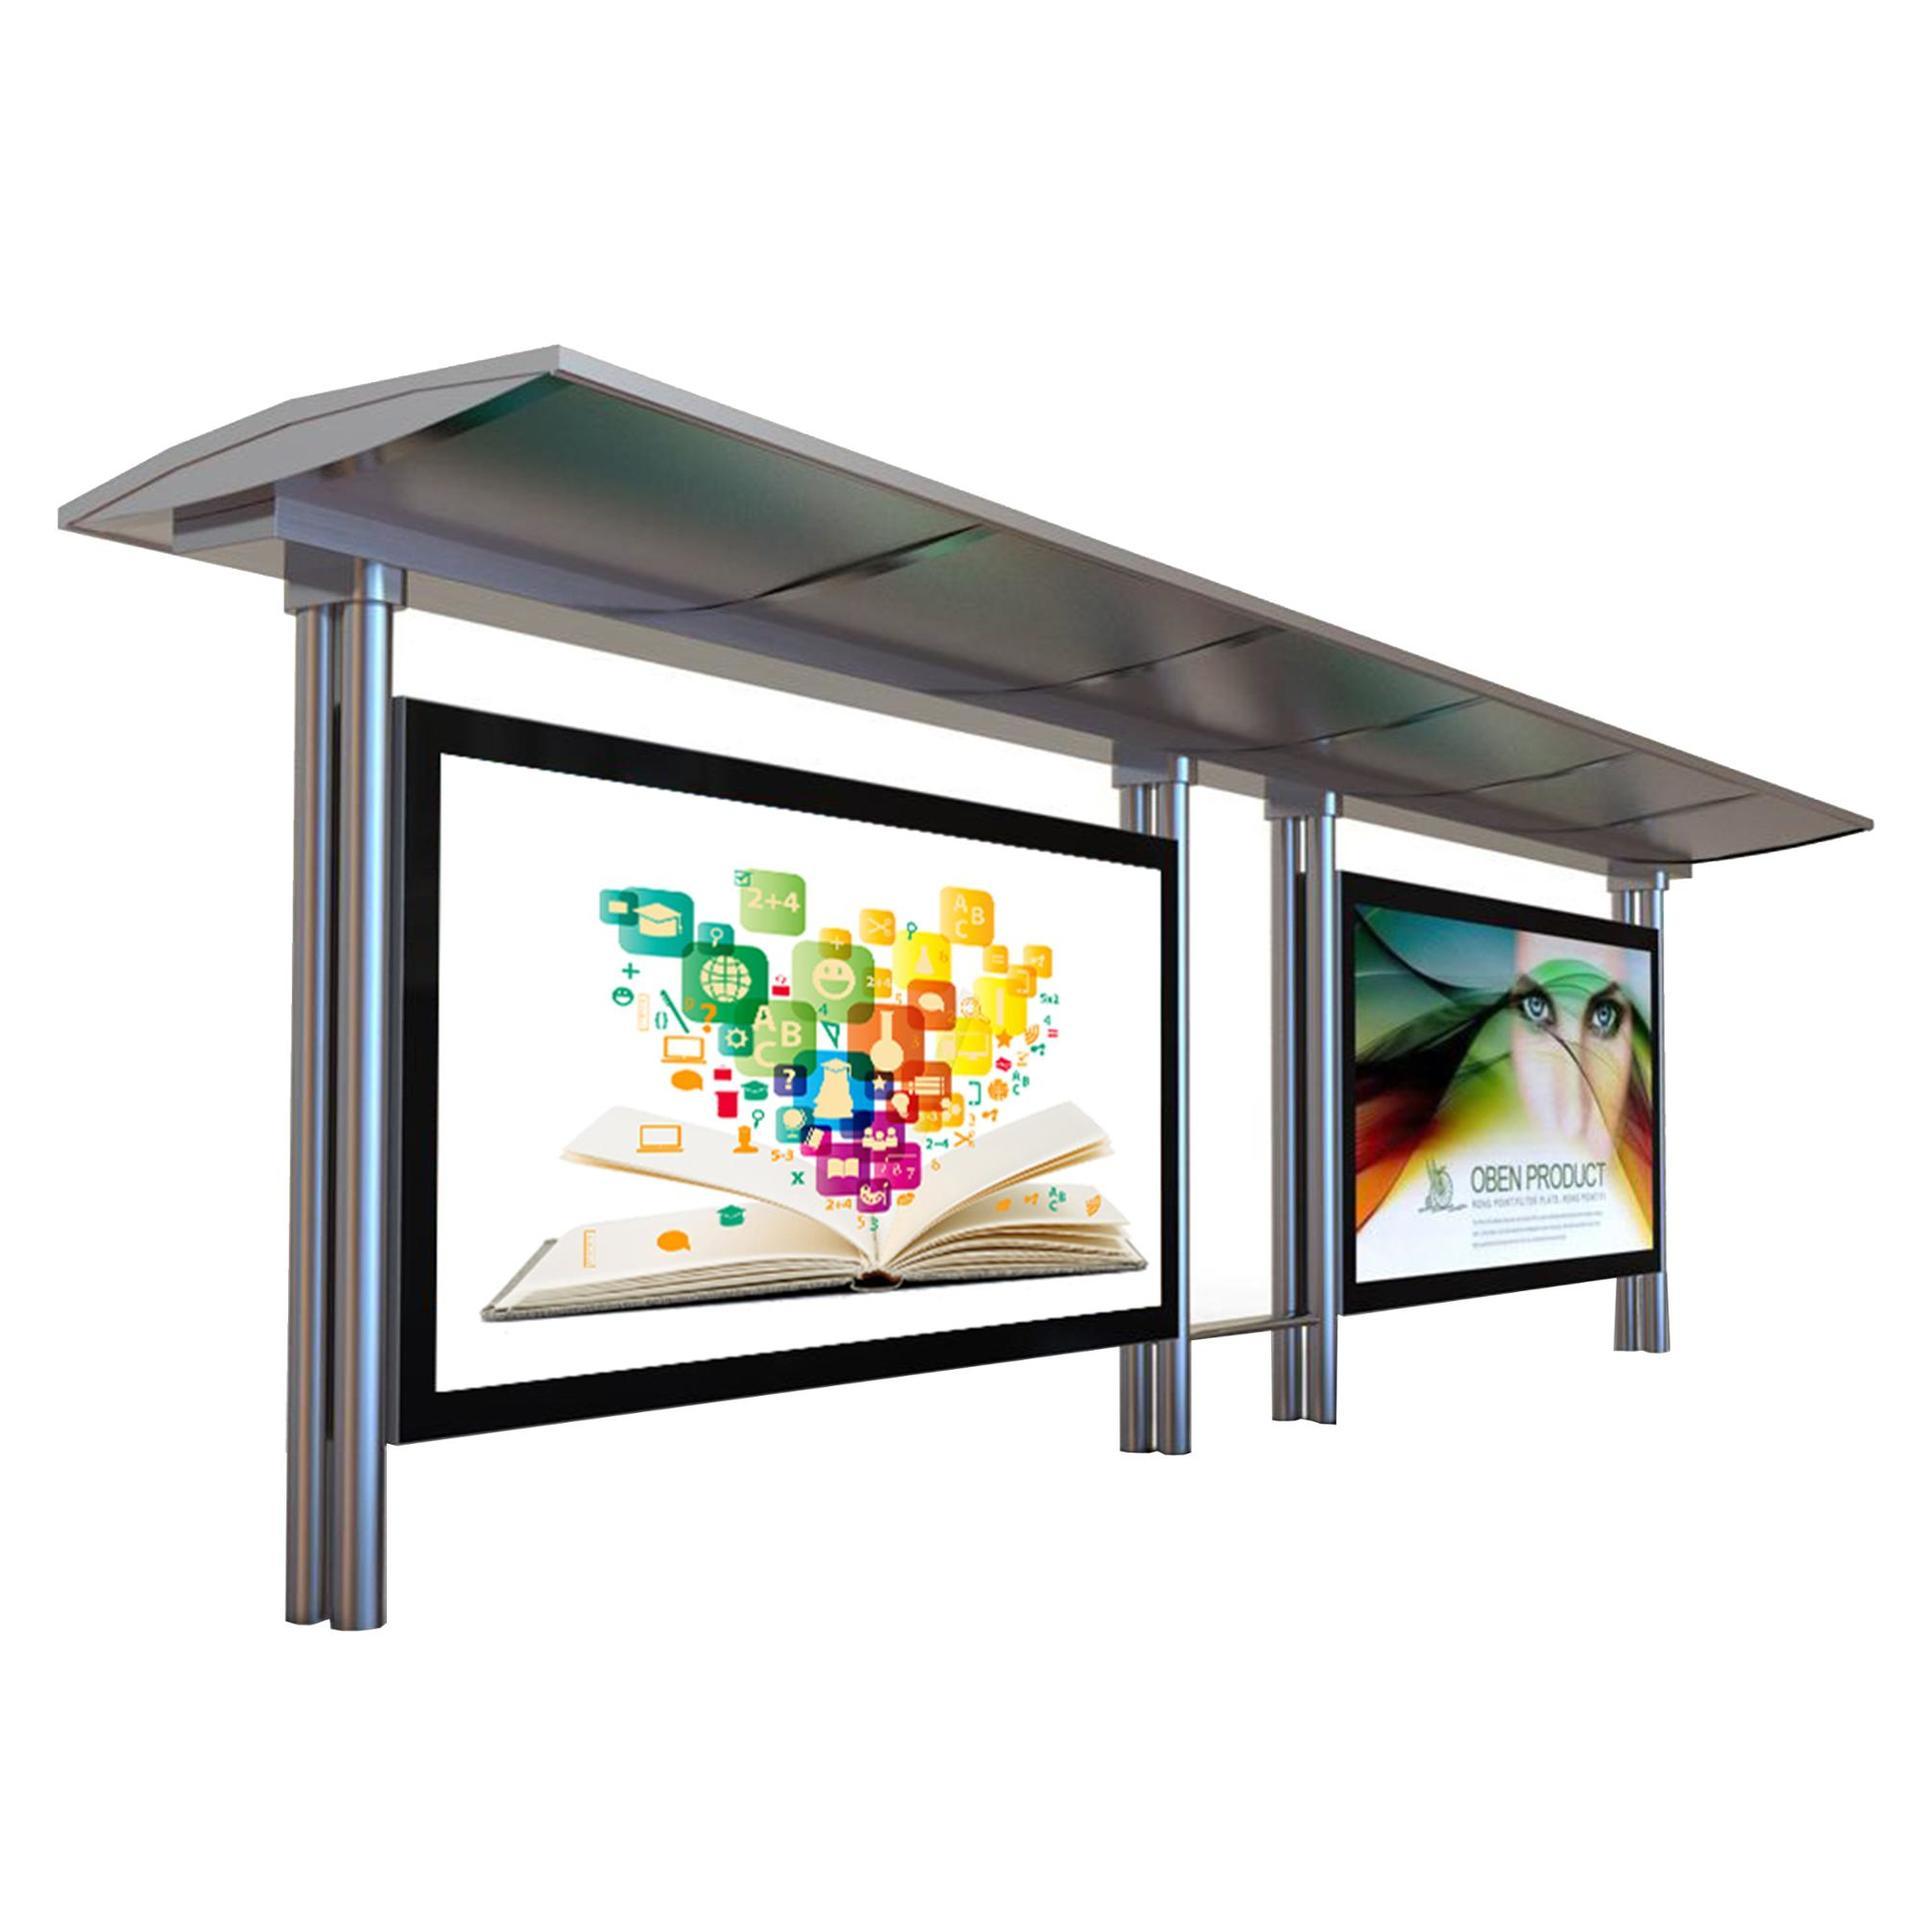 Customize design stainless steel bus shelter Advertising Light Box